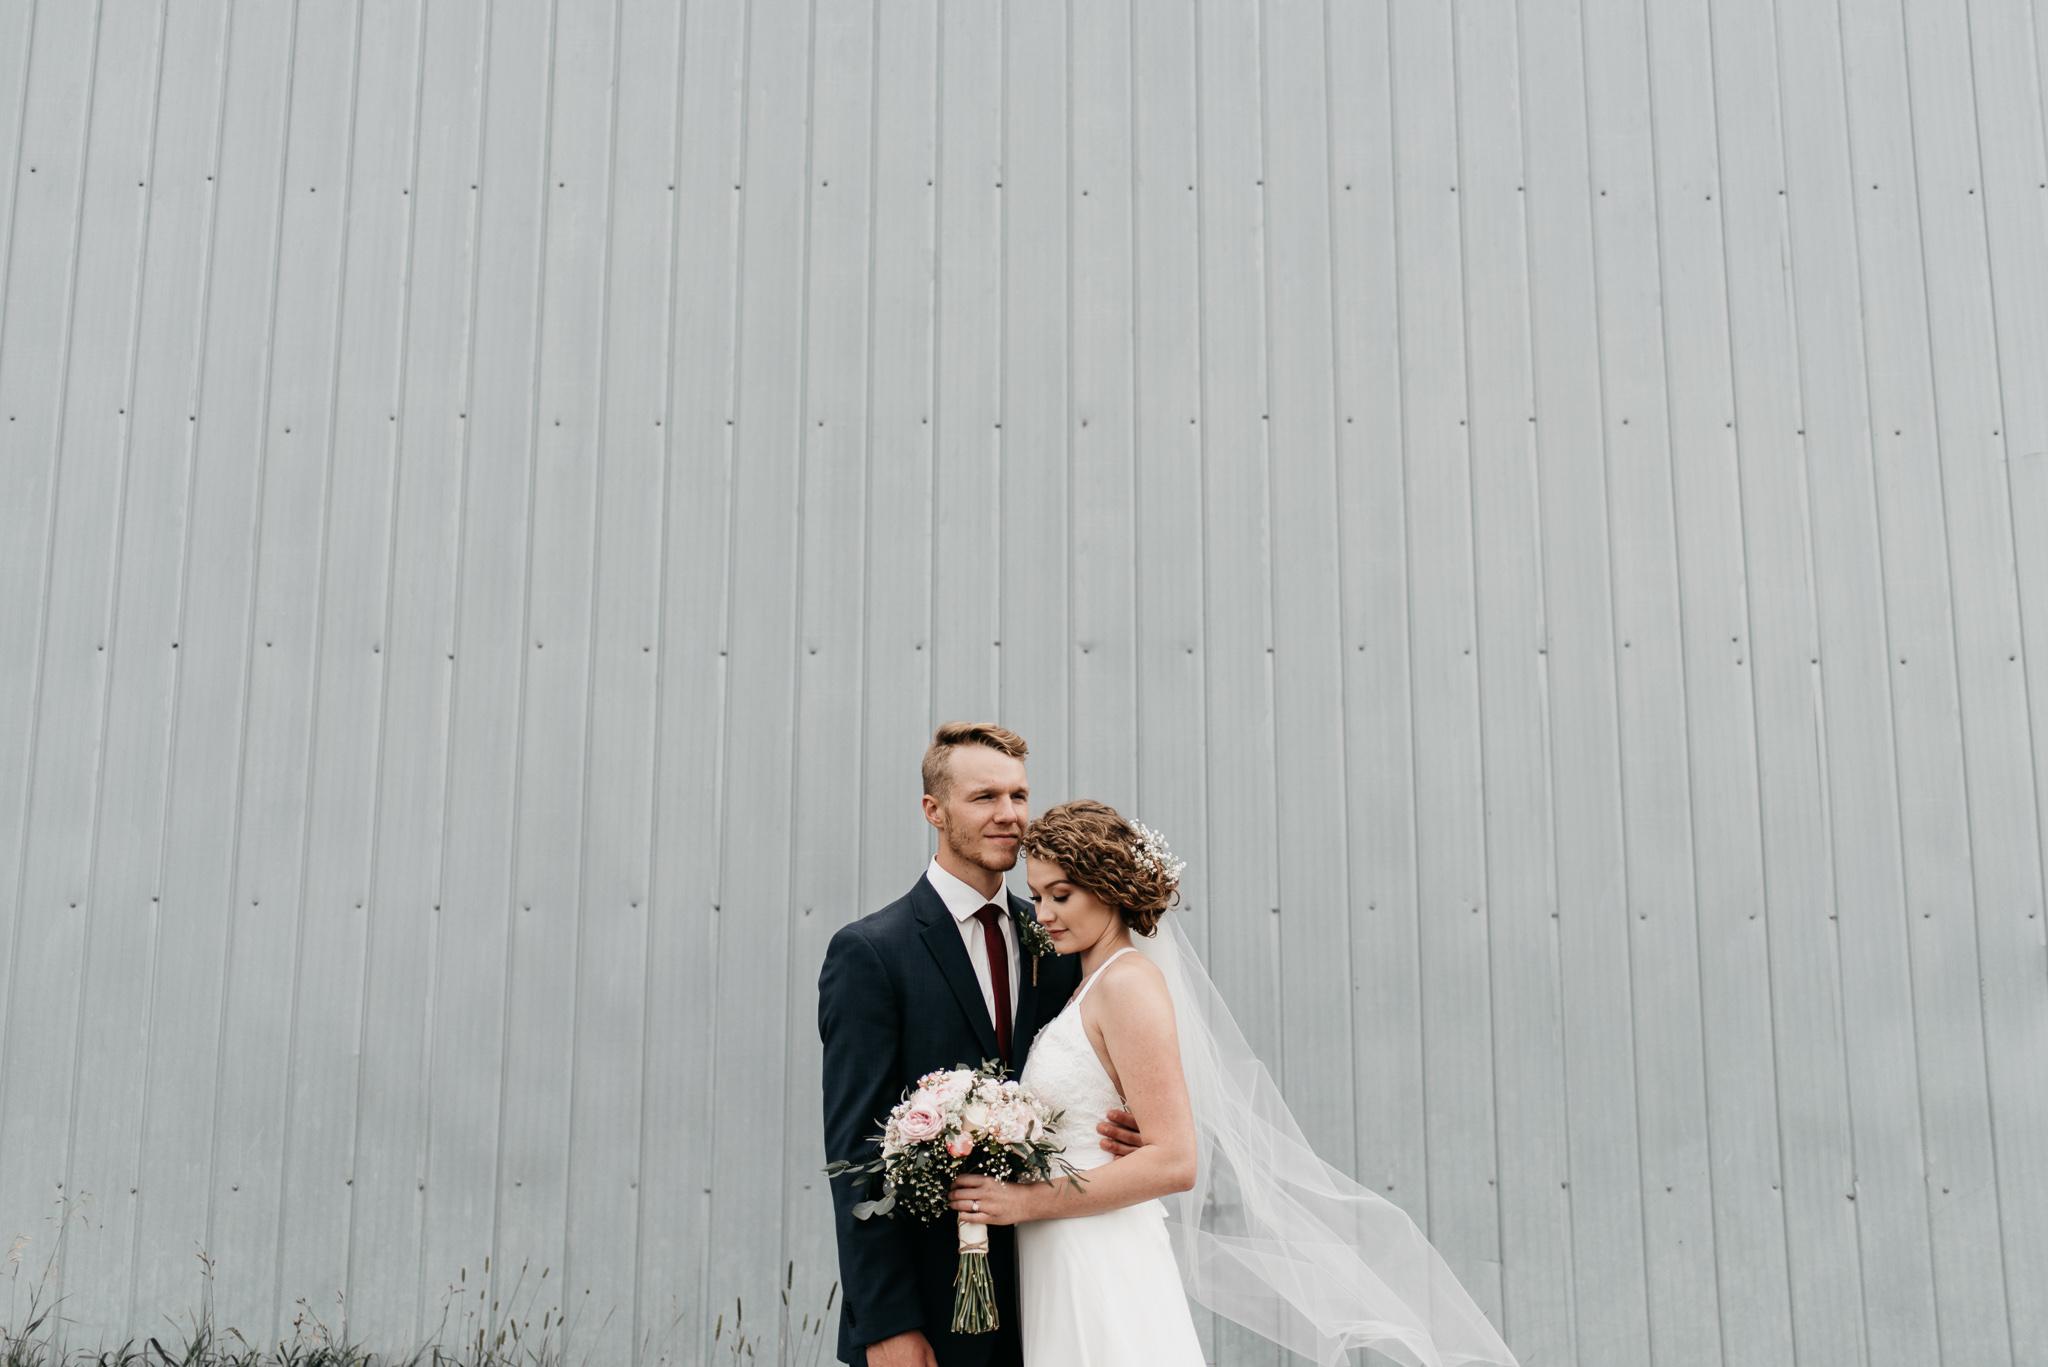 J&C-Weddingblog-47.jpg